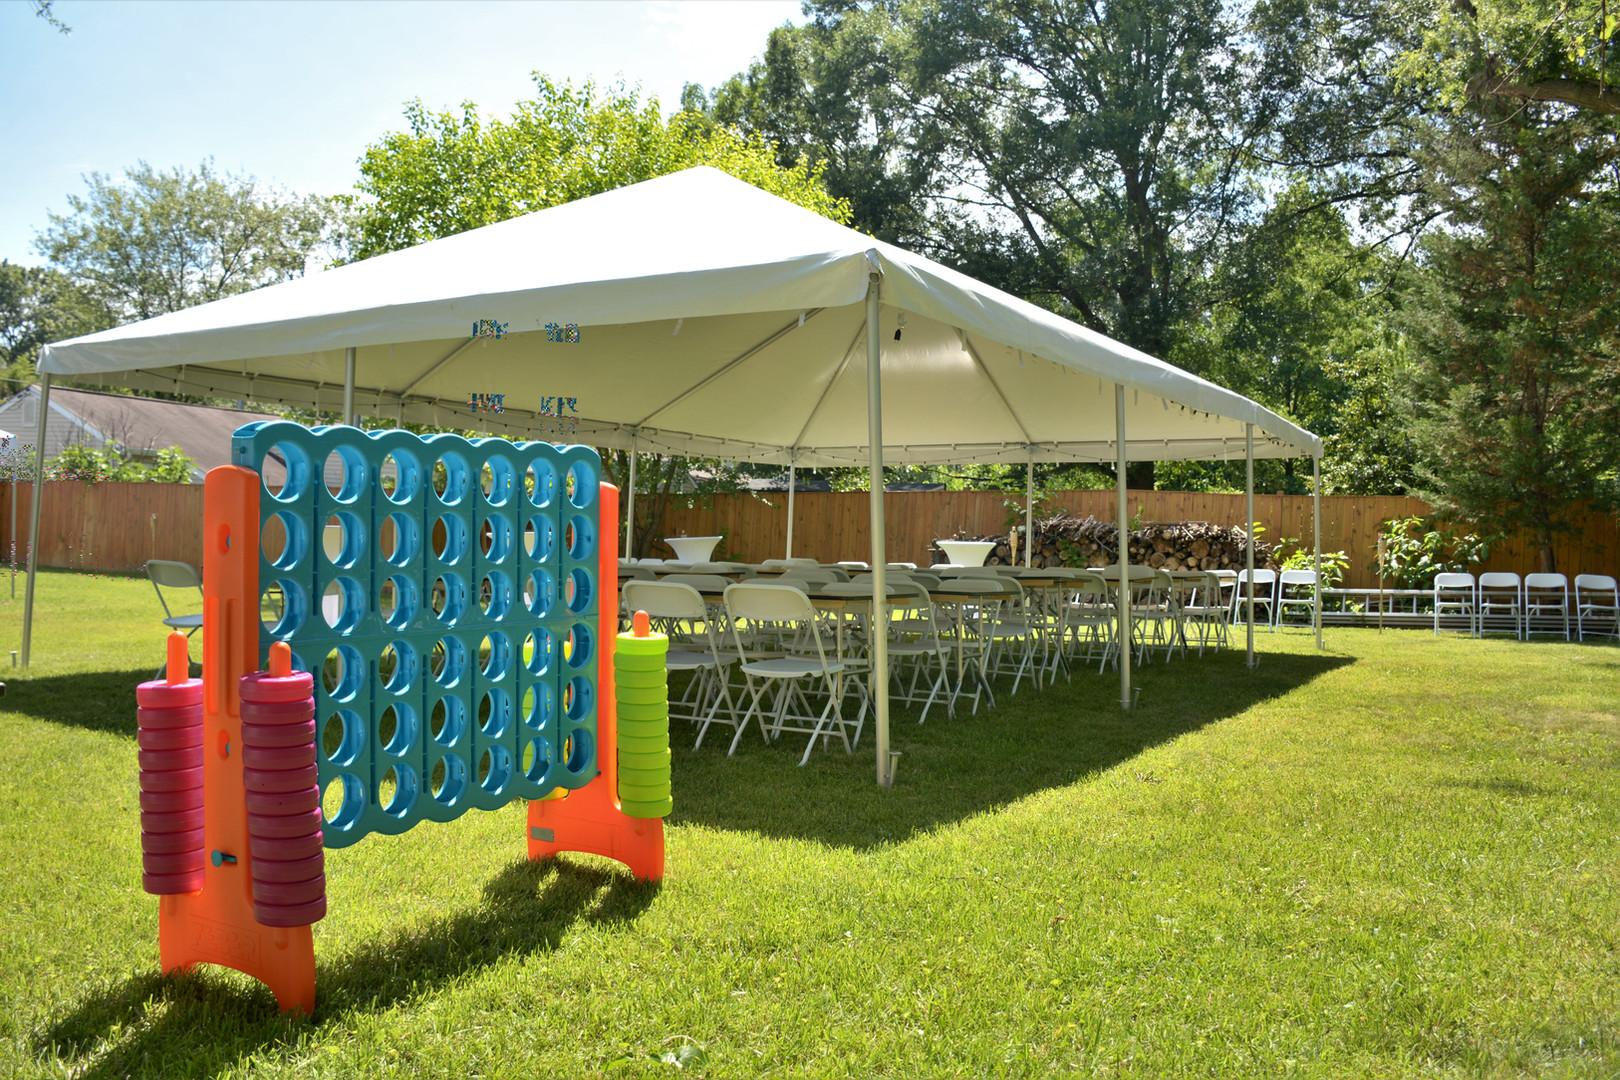 Backyard Tent & Games